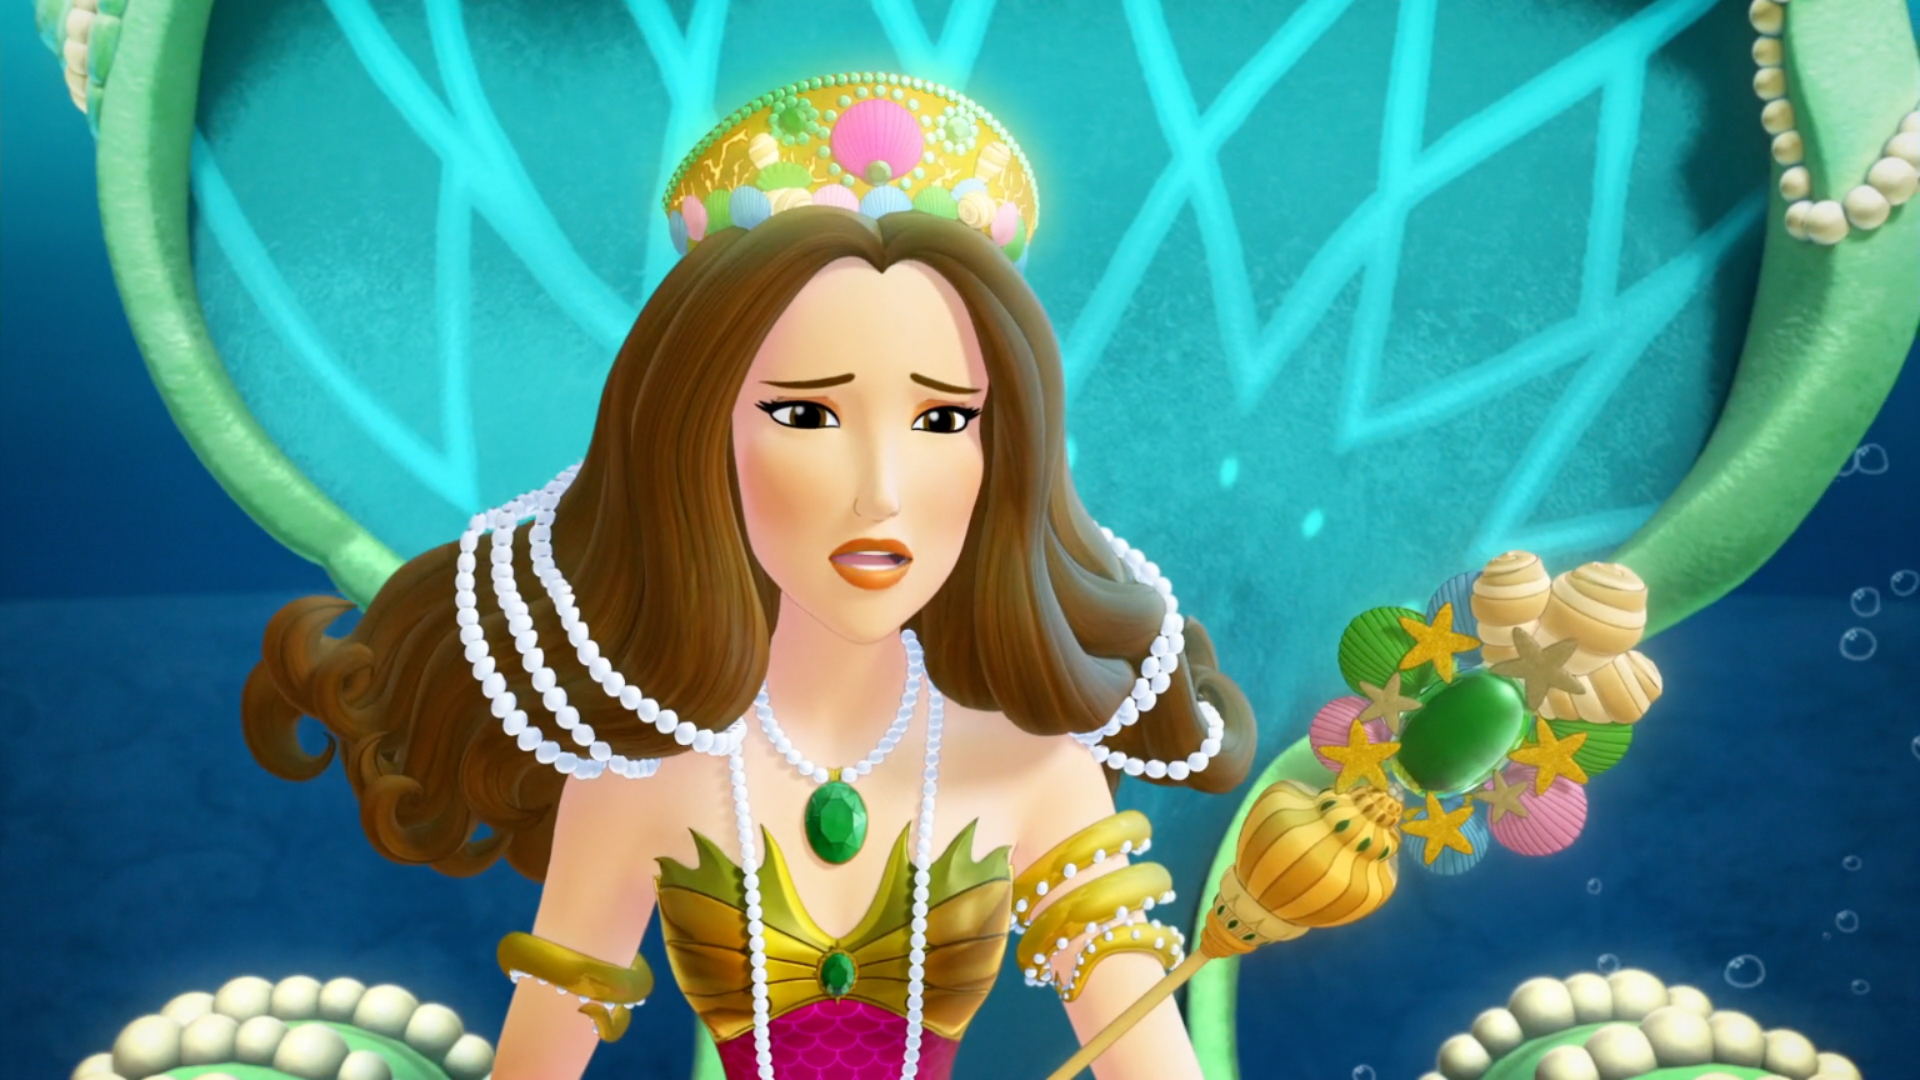 Queen Emmaline Sofia The First Wiki Fandom Powered By